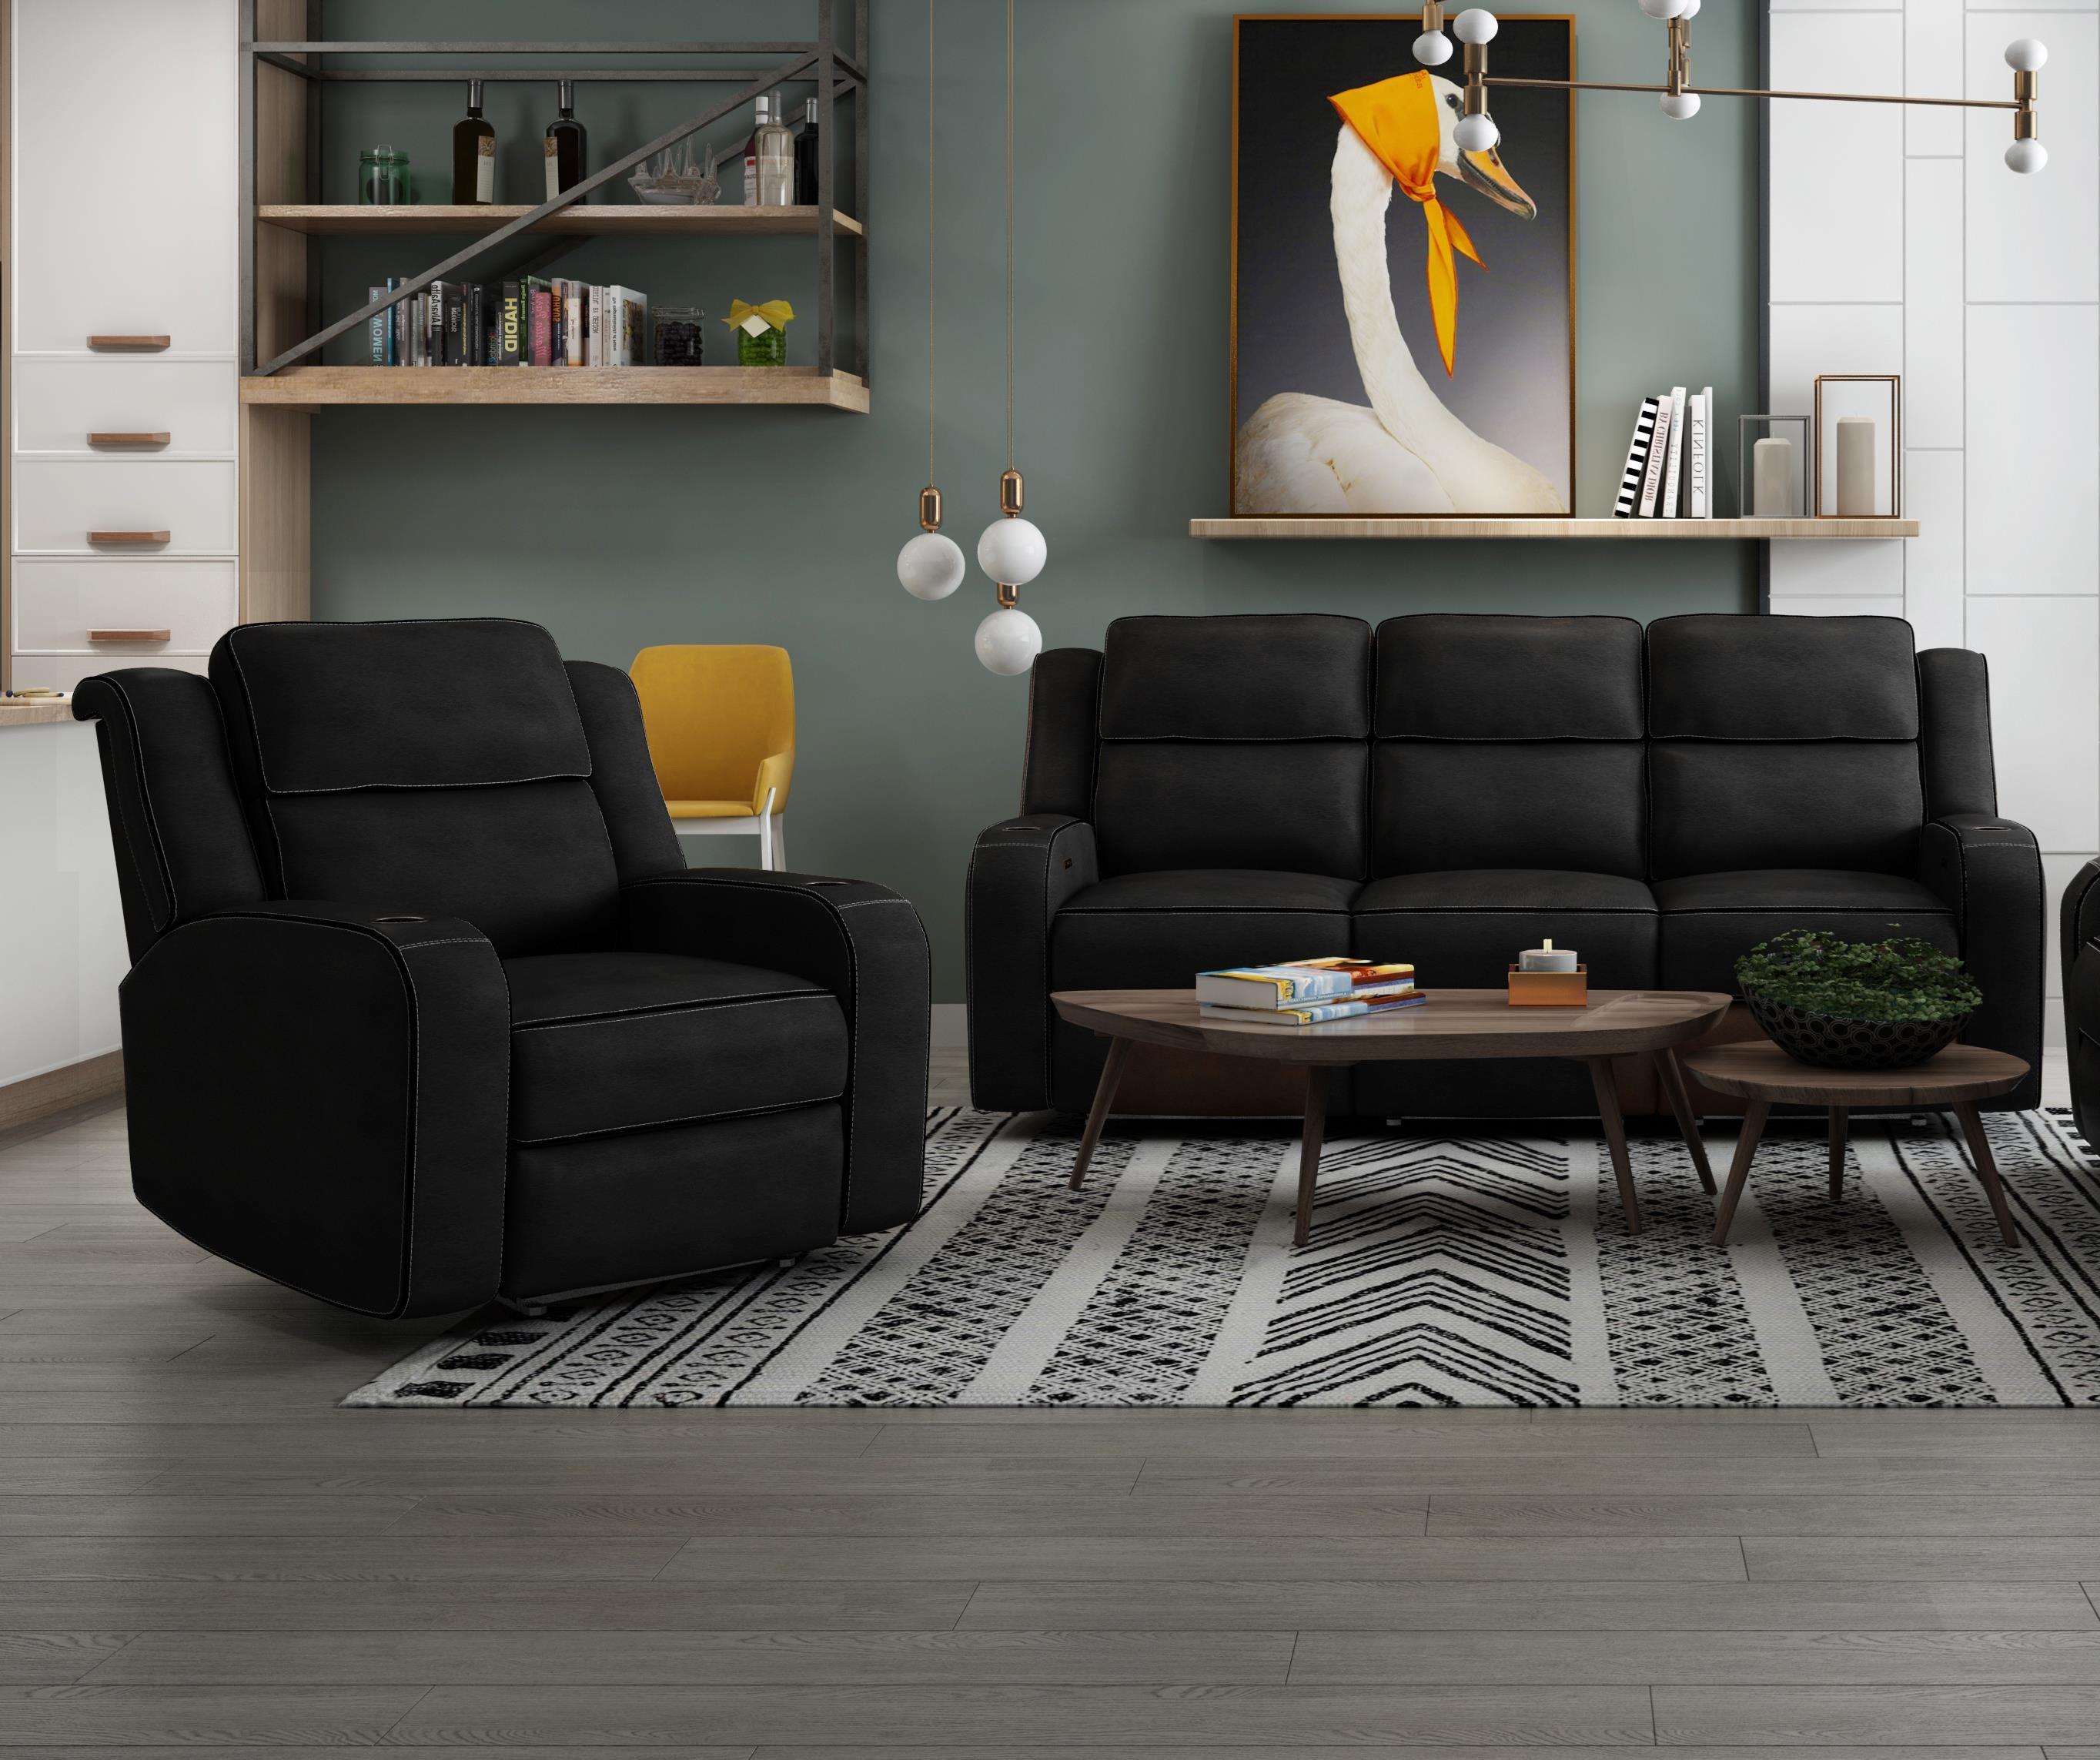 2 PC Power Reclining Living Room Set